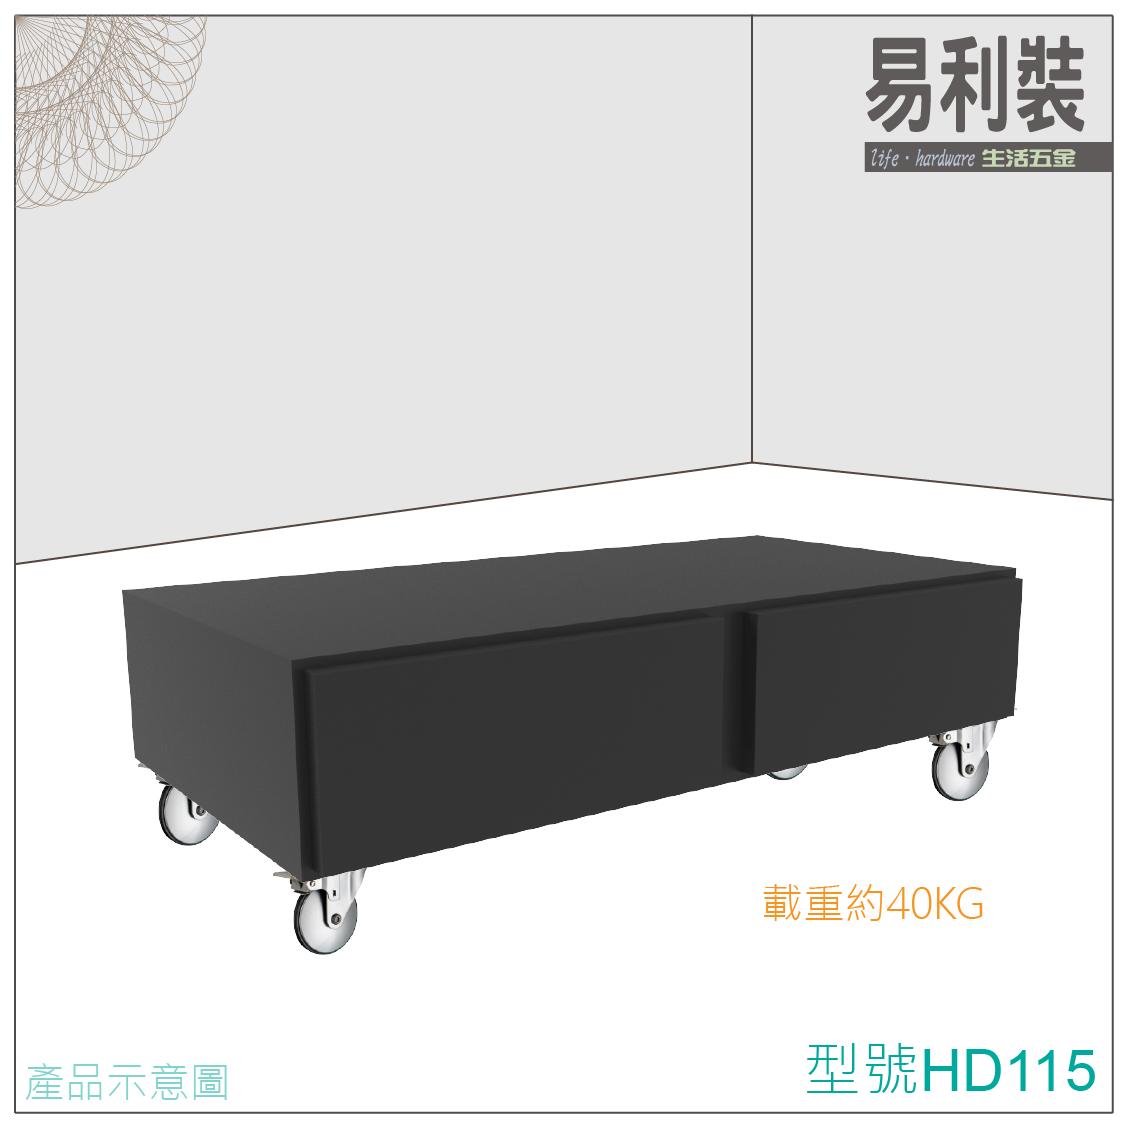 【 EASYCAN  】HD114-115活動輪 易利裝生活五金 桌輪 櫃輪 房間 臥房 衣櫃 小資族 辦公家具 系統家具 3